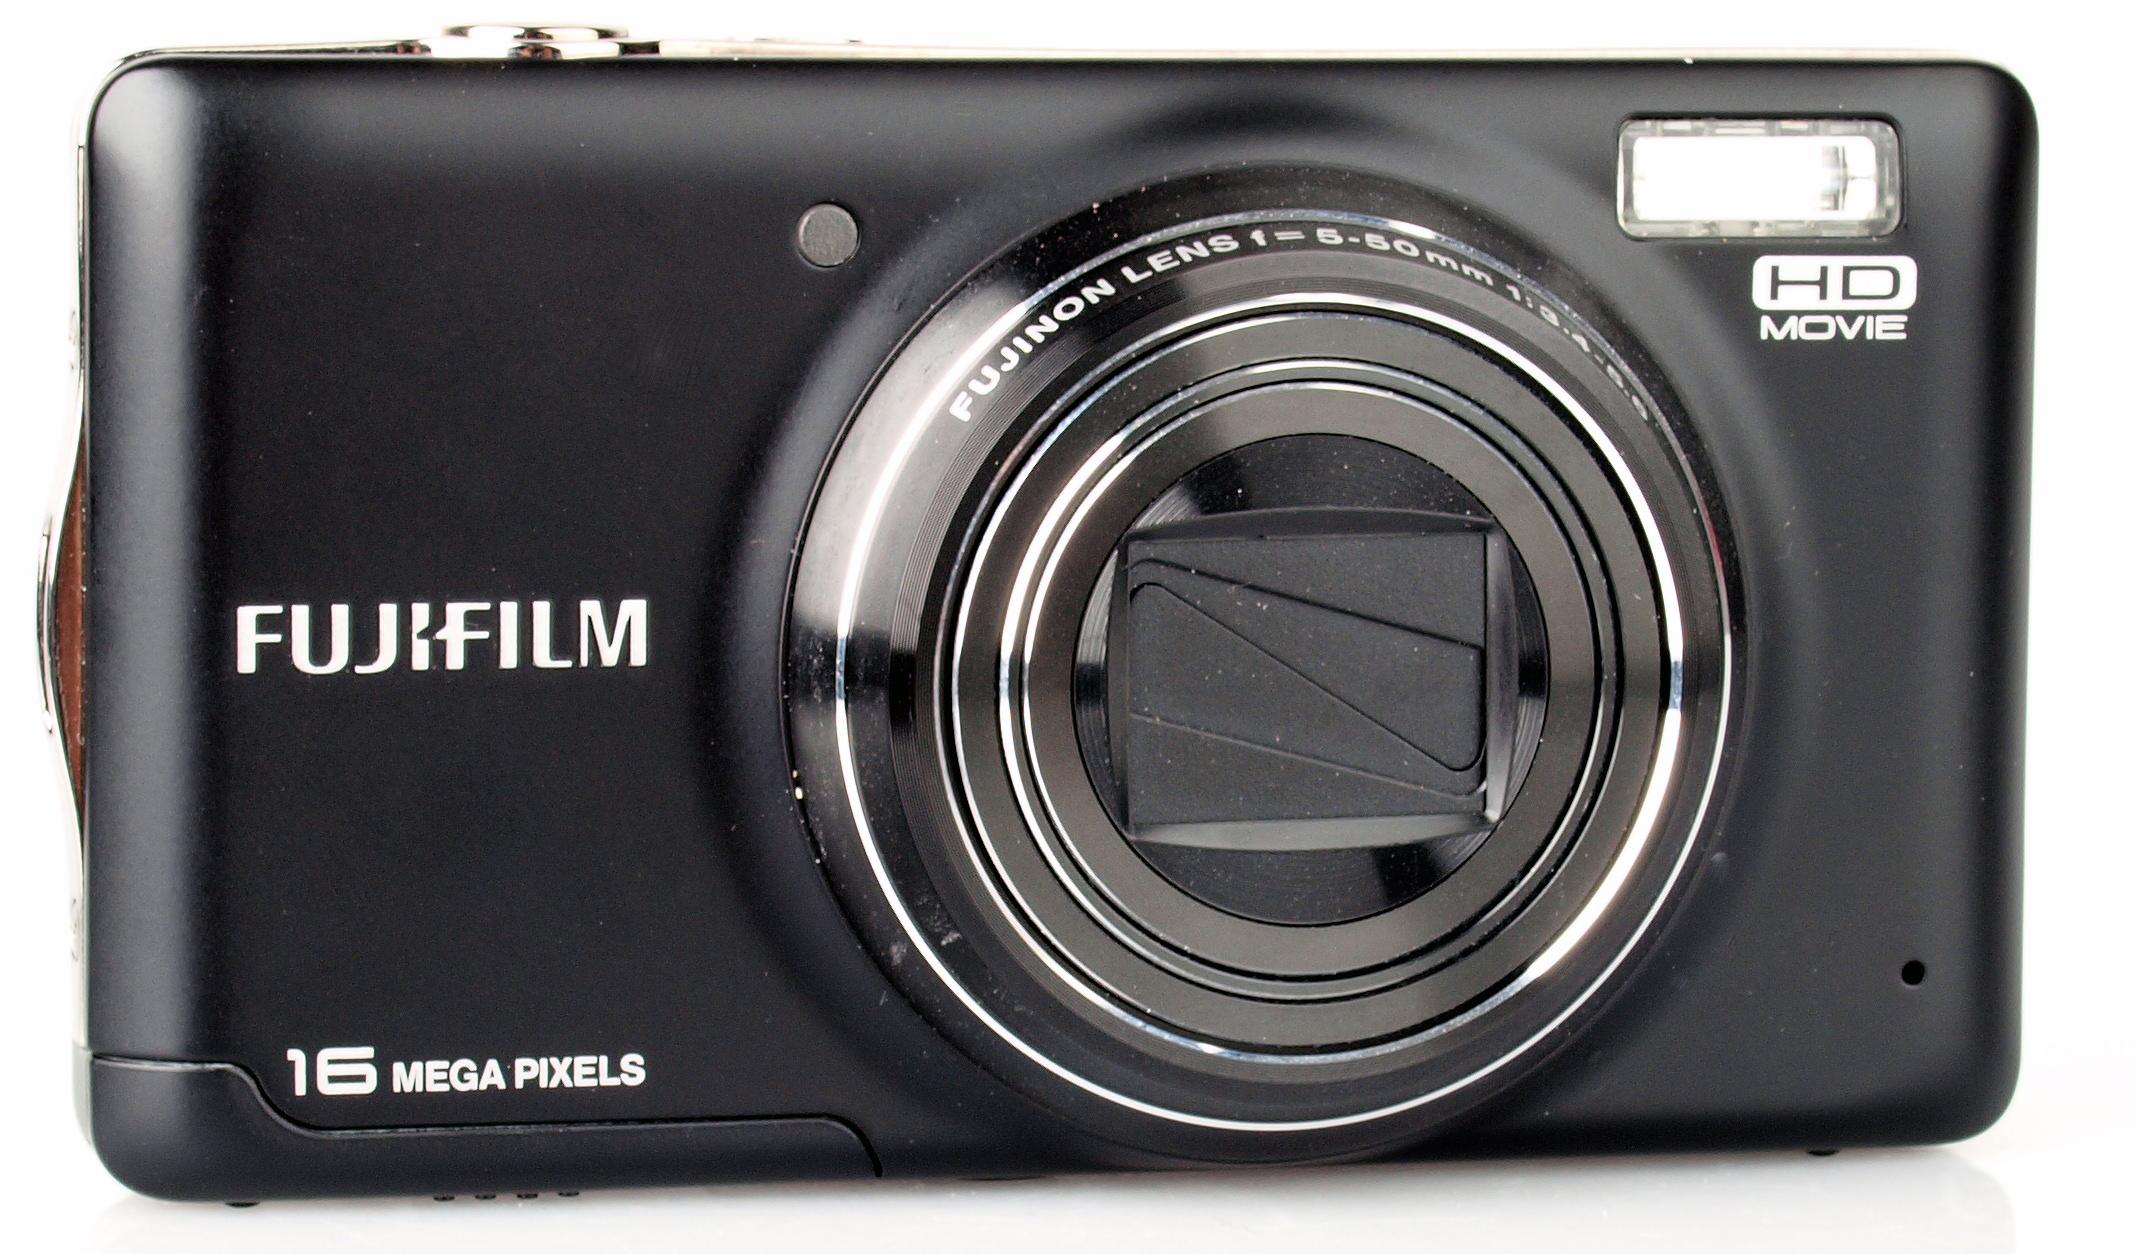 Camera Fujifilm Digital Cameras fujifilm finepix t400 digital camera review front 1